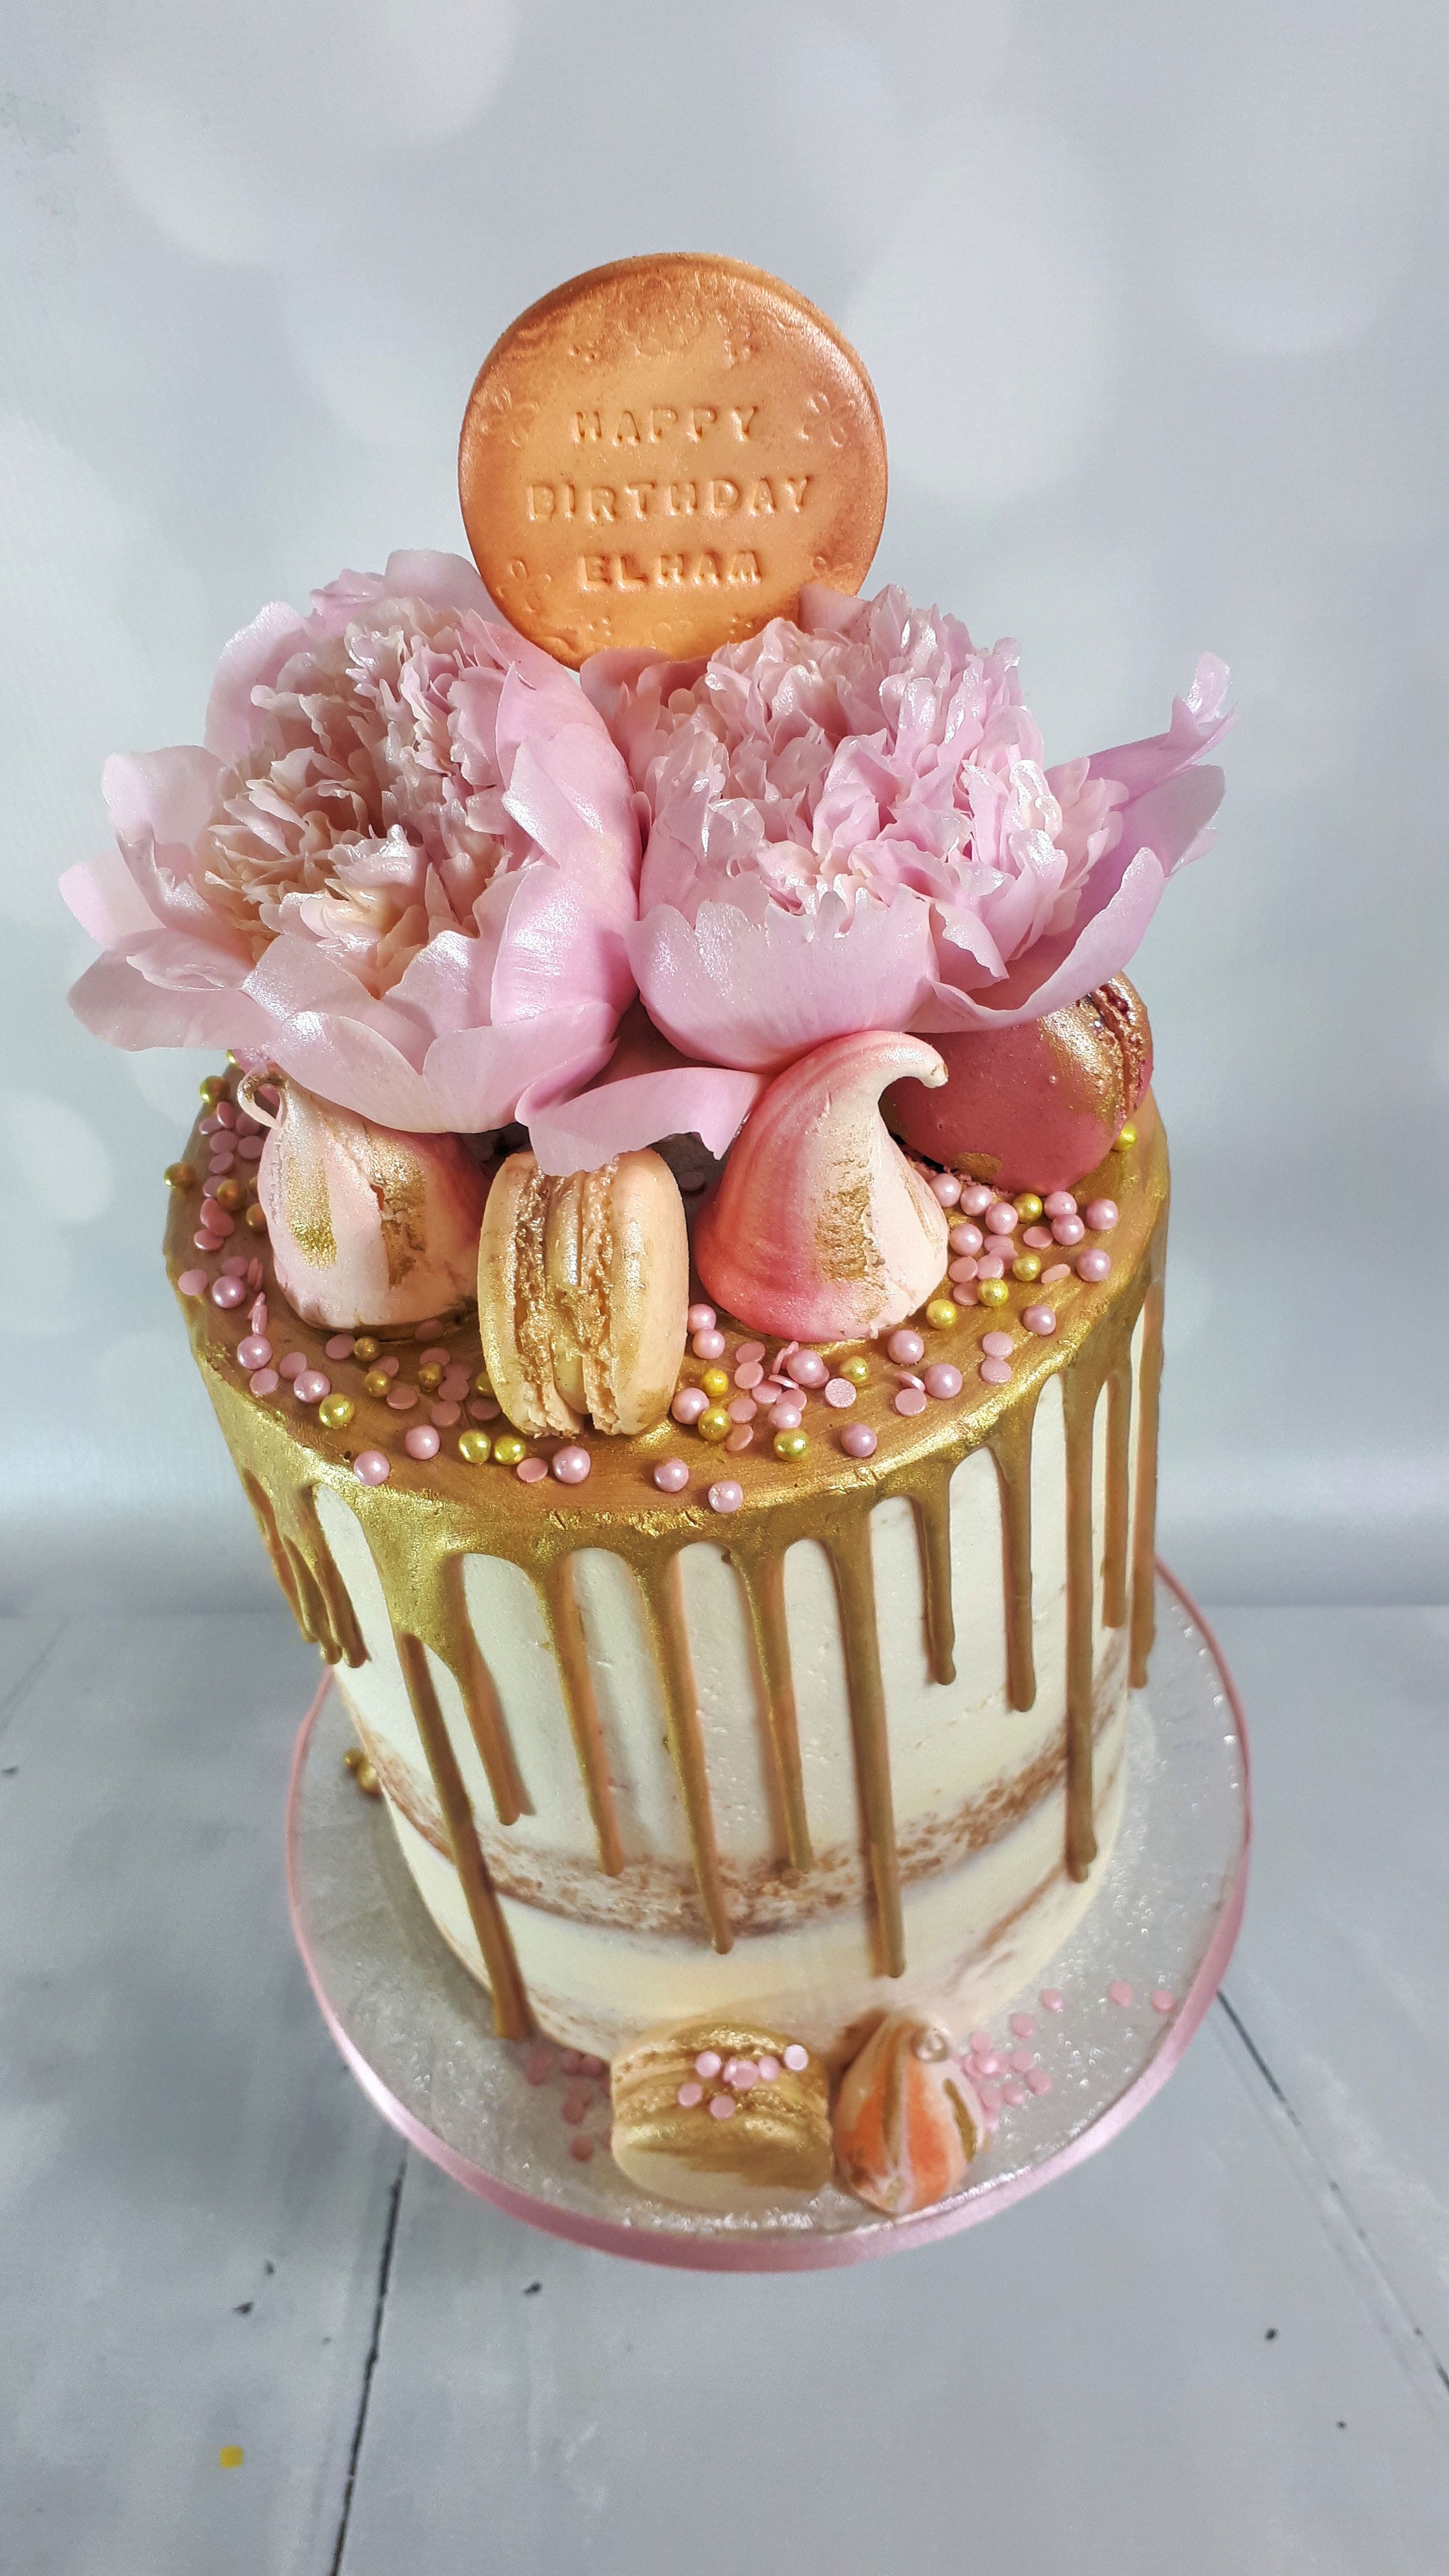 Buttercream Drip Cake.jpg